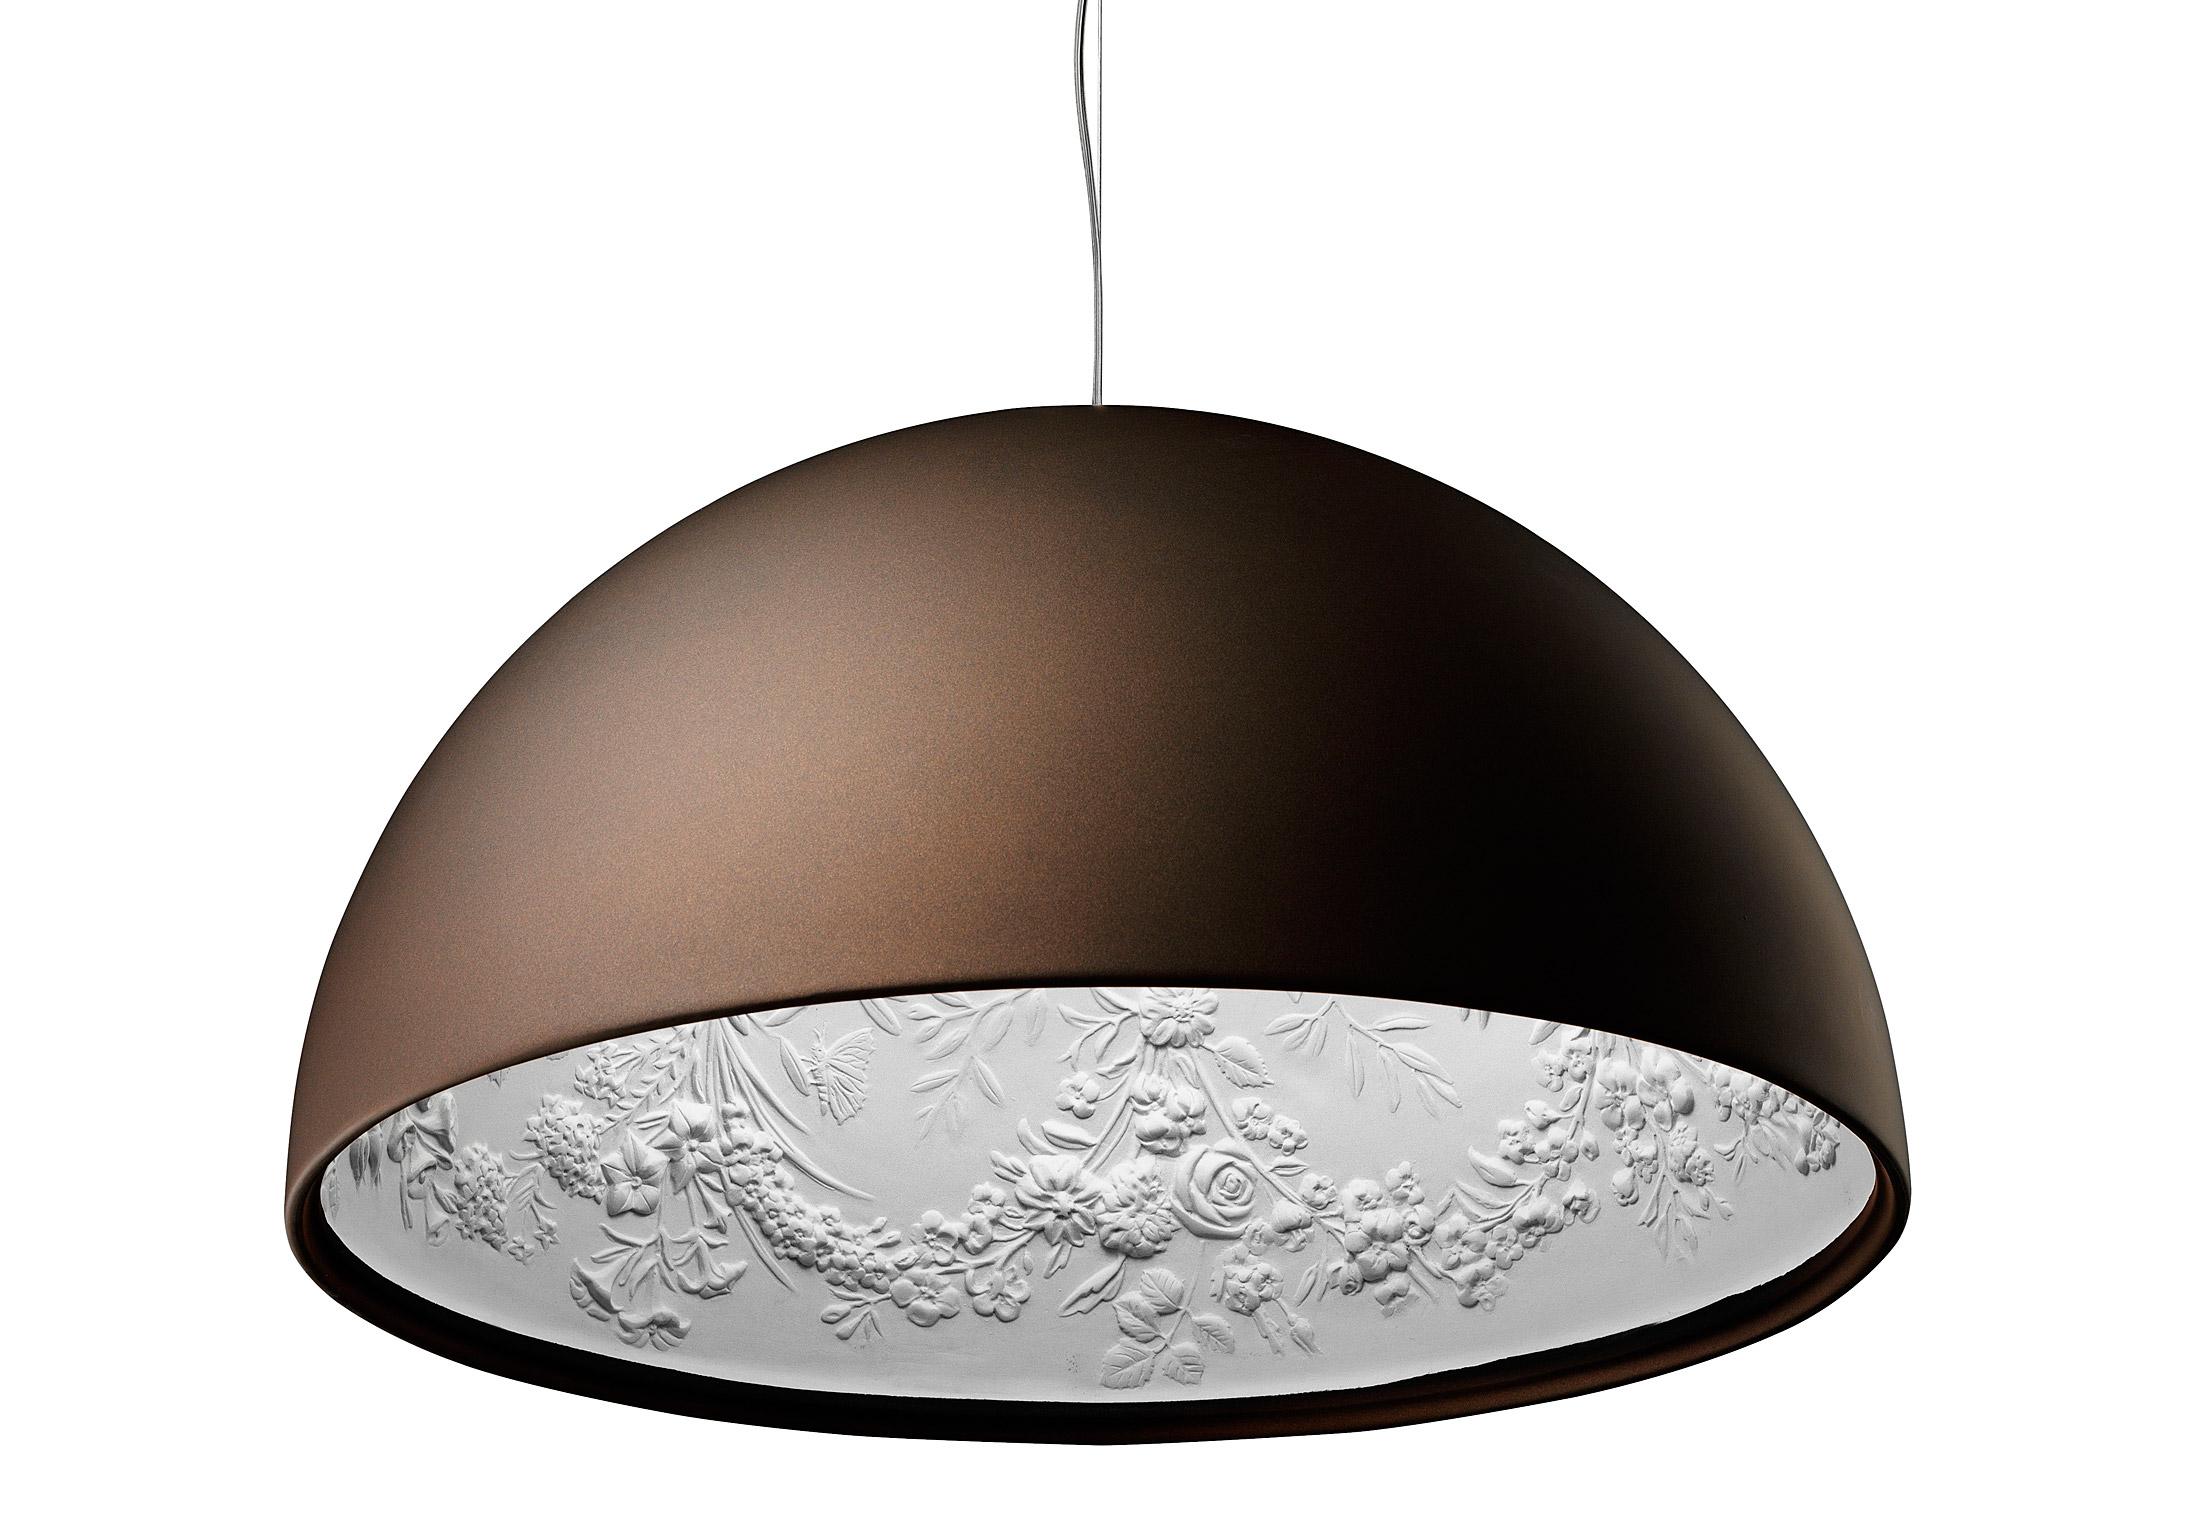 Sky garden di flos lampadari illuminazione mollura for Lampen namen